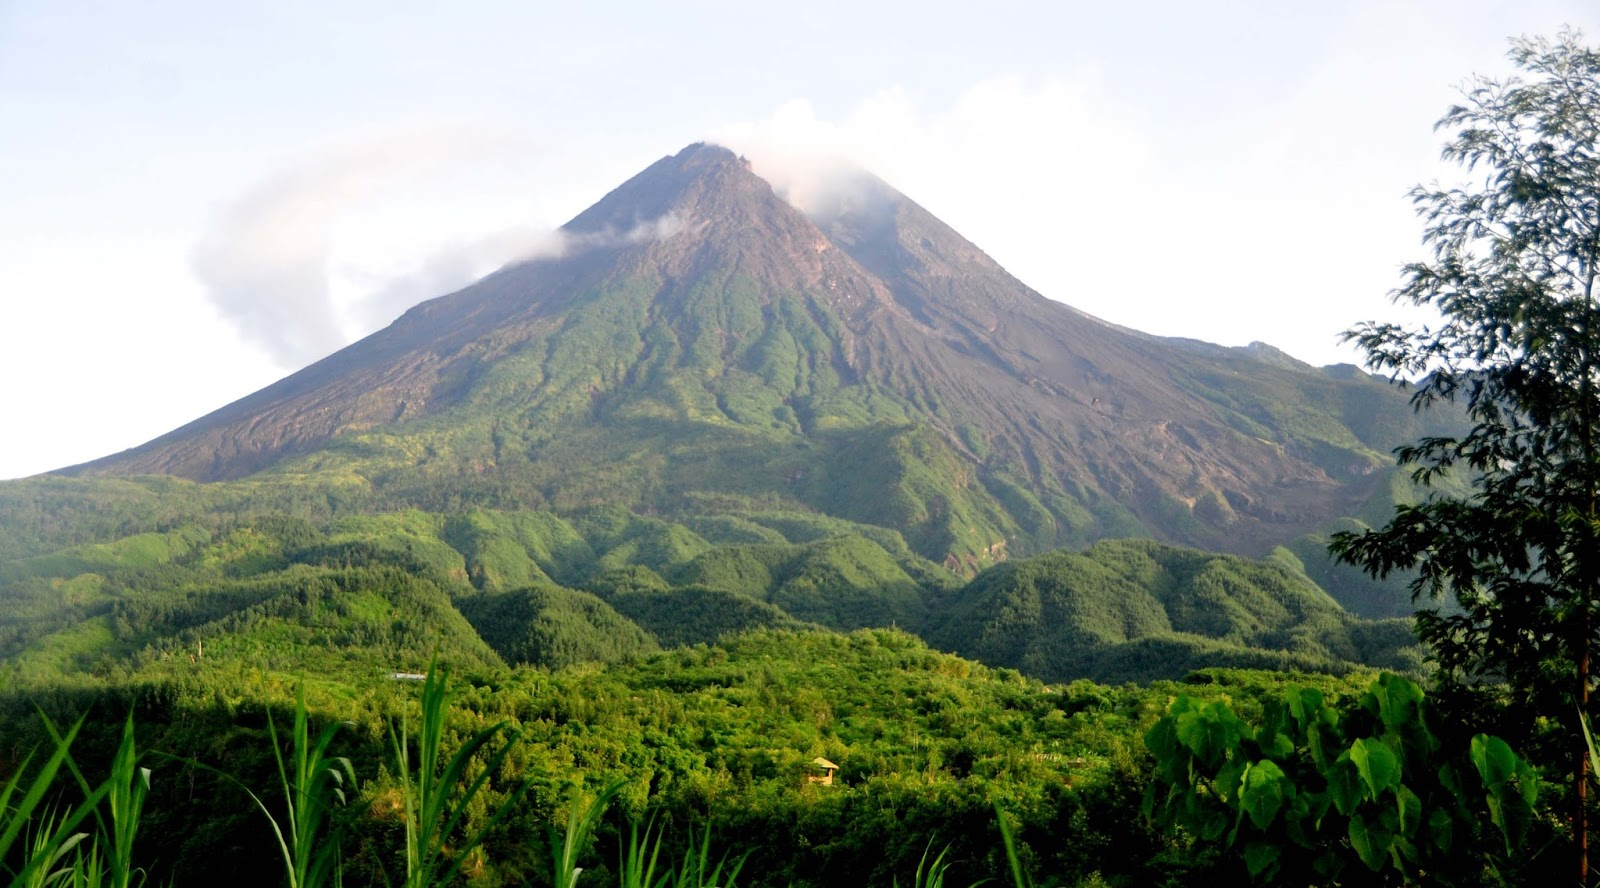 Tempat Tempat Wisata di Daerah Gunung Merapi Jogja - Yogyakarta